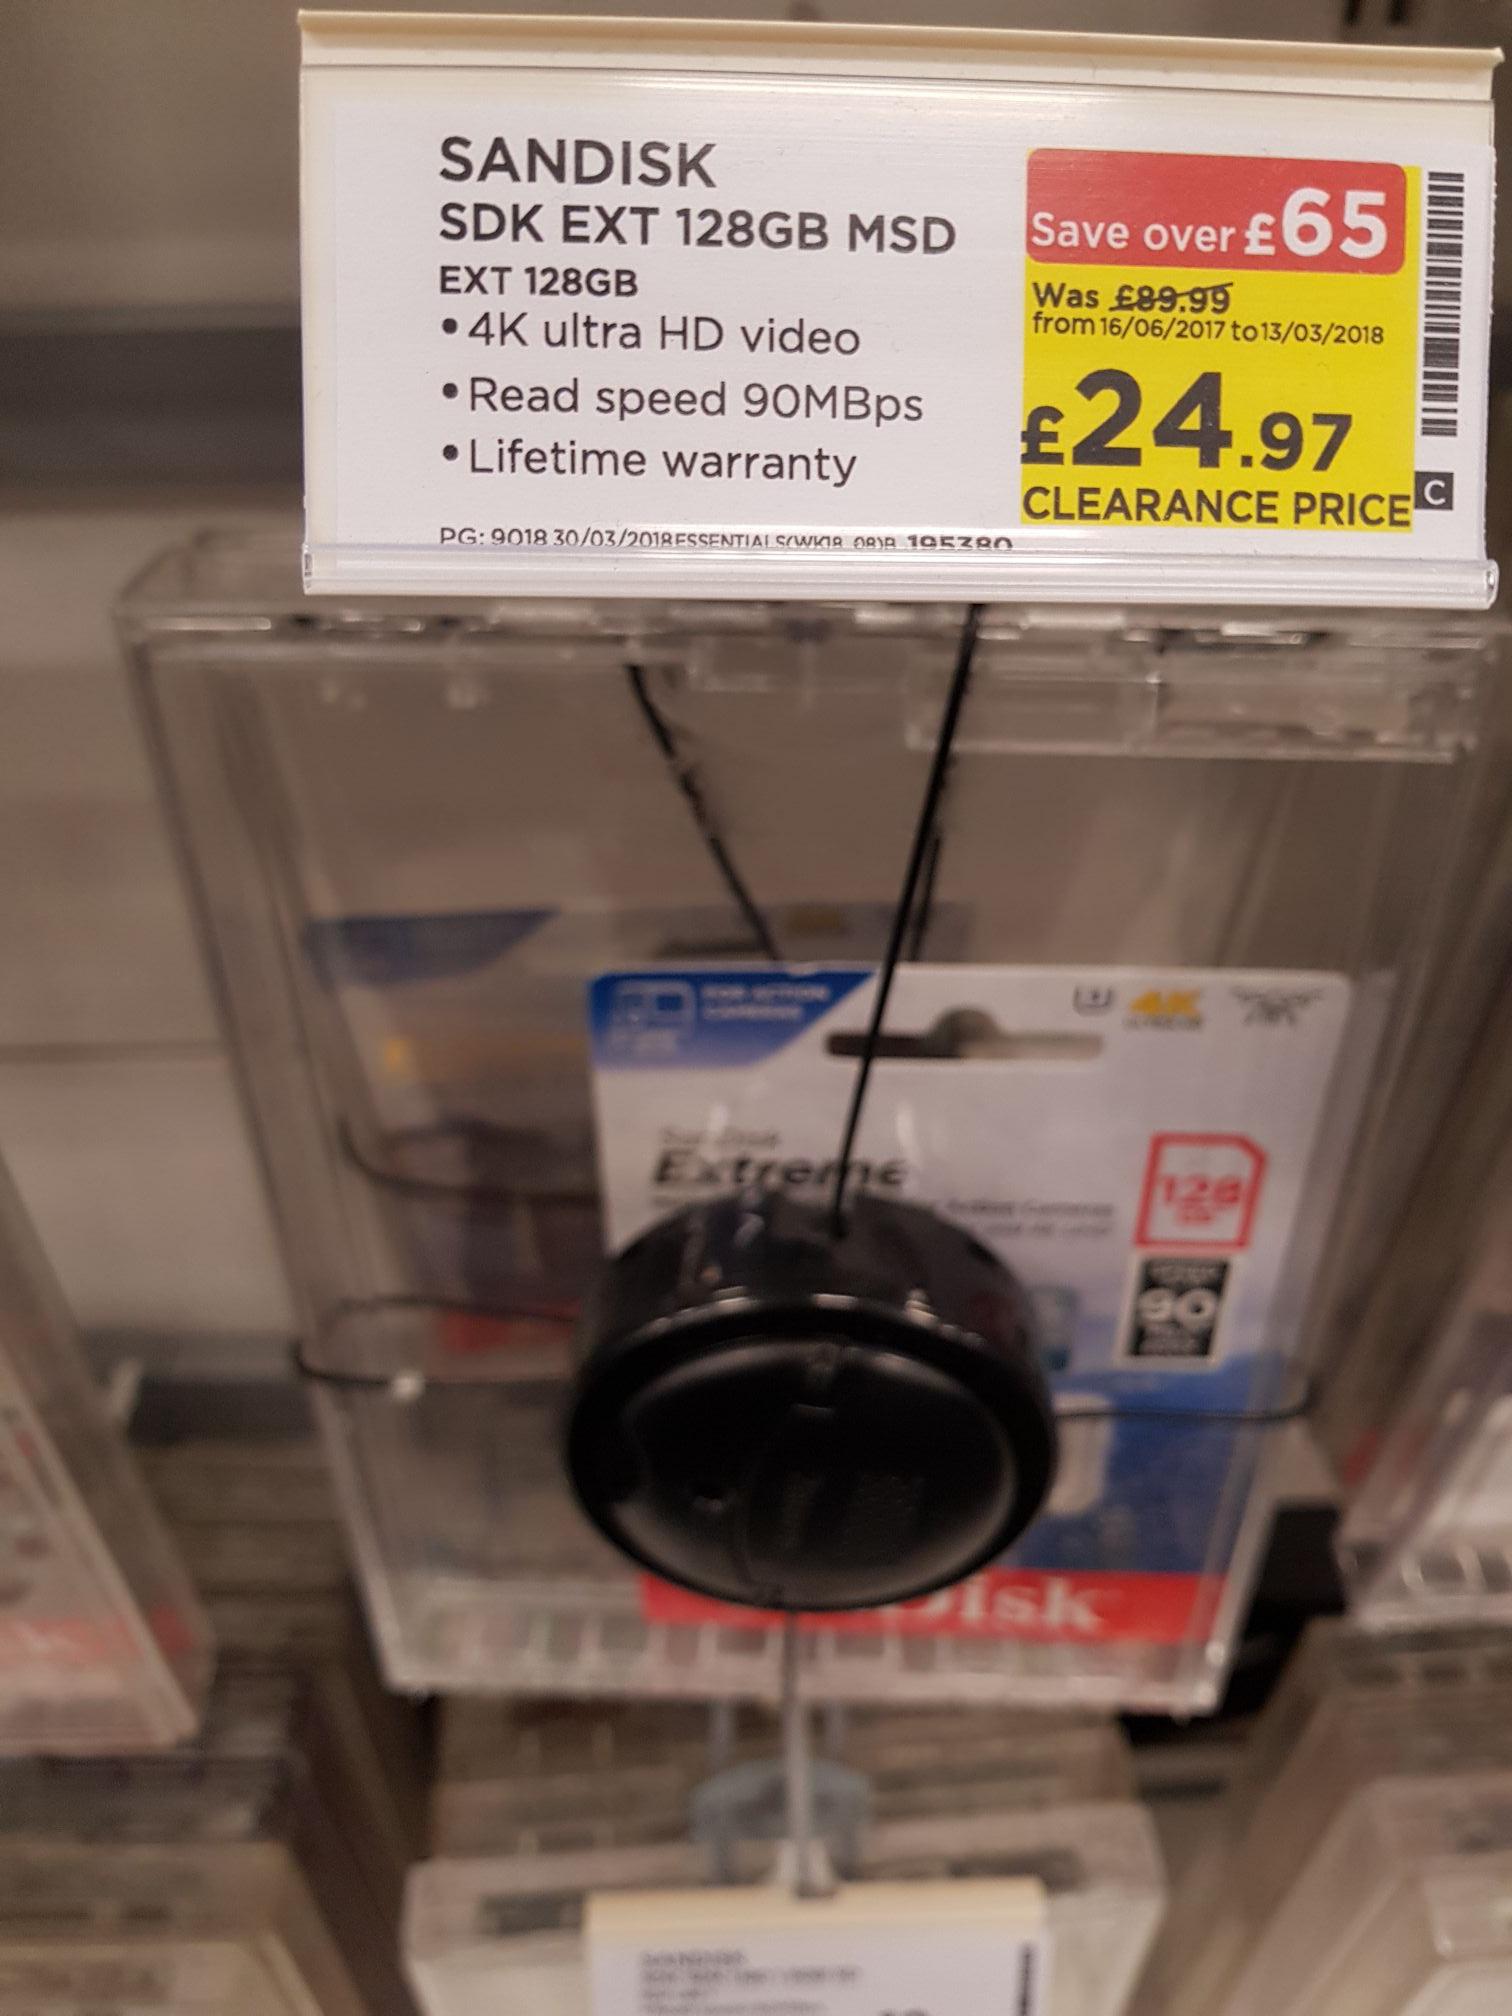 SanDisk Extreme MicroSDXC 128GB 4K UHS3 V30 - 24.99 in Currys PCWorld